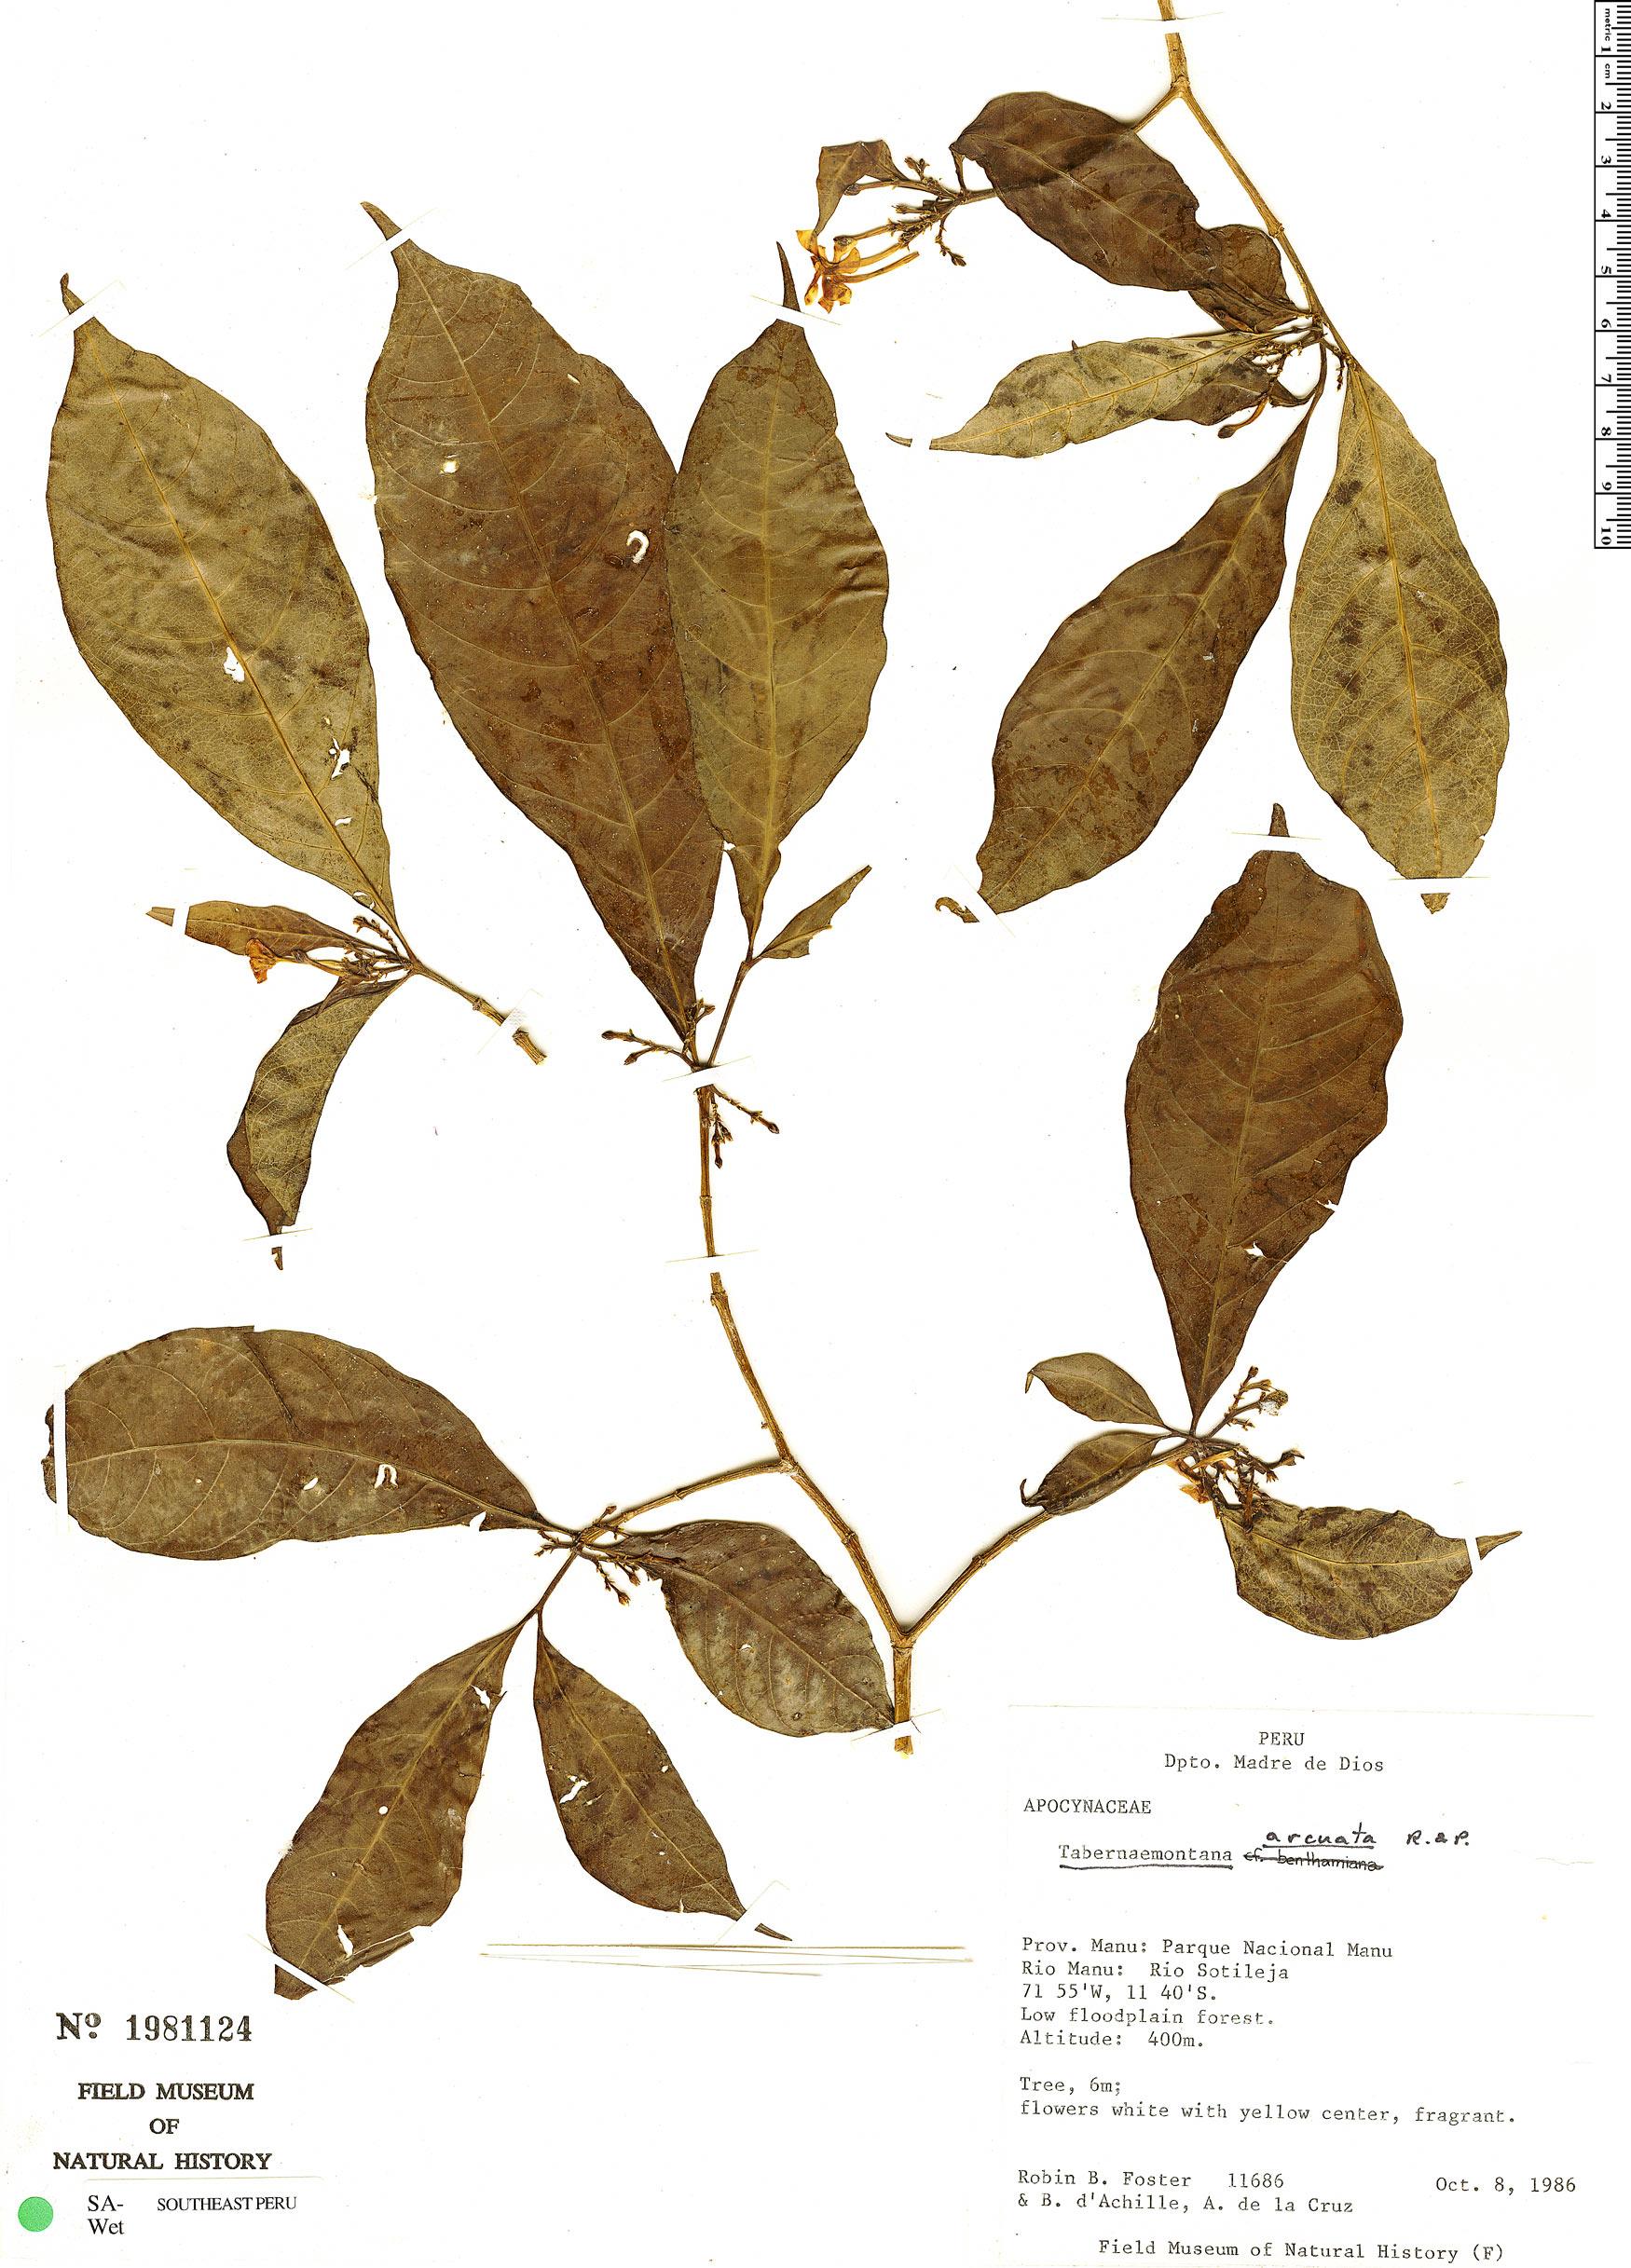 Specimen: Tabernaemontana vanheurckii